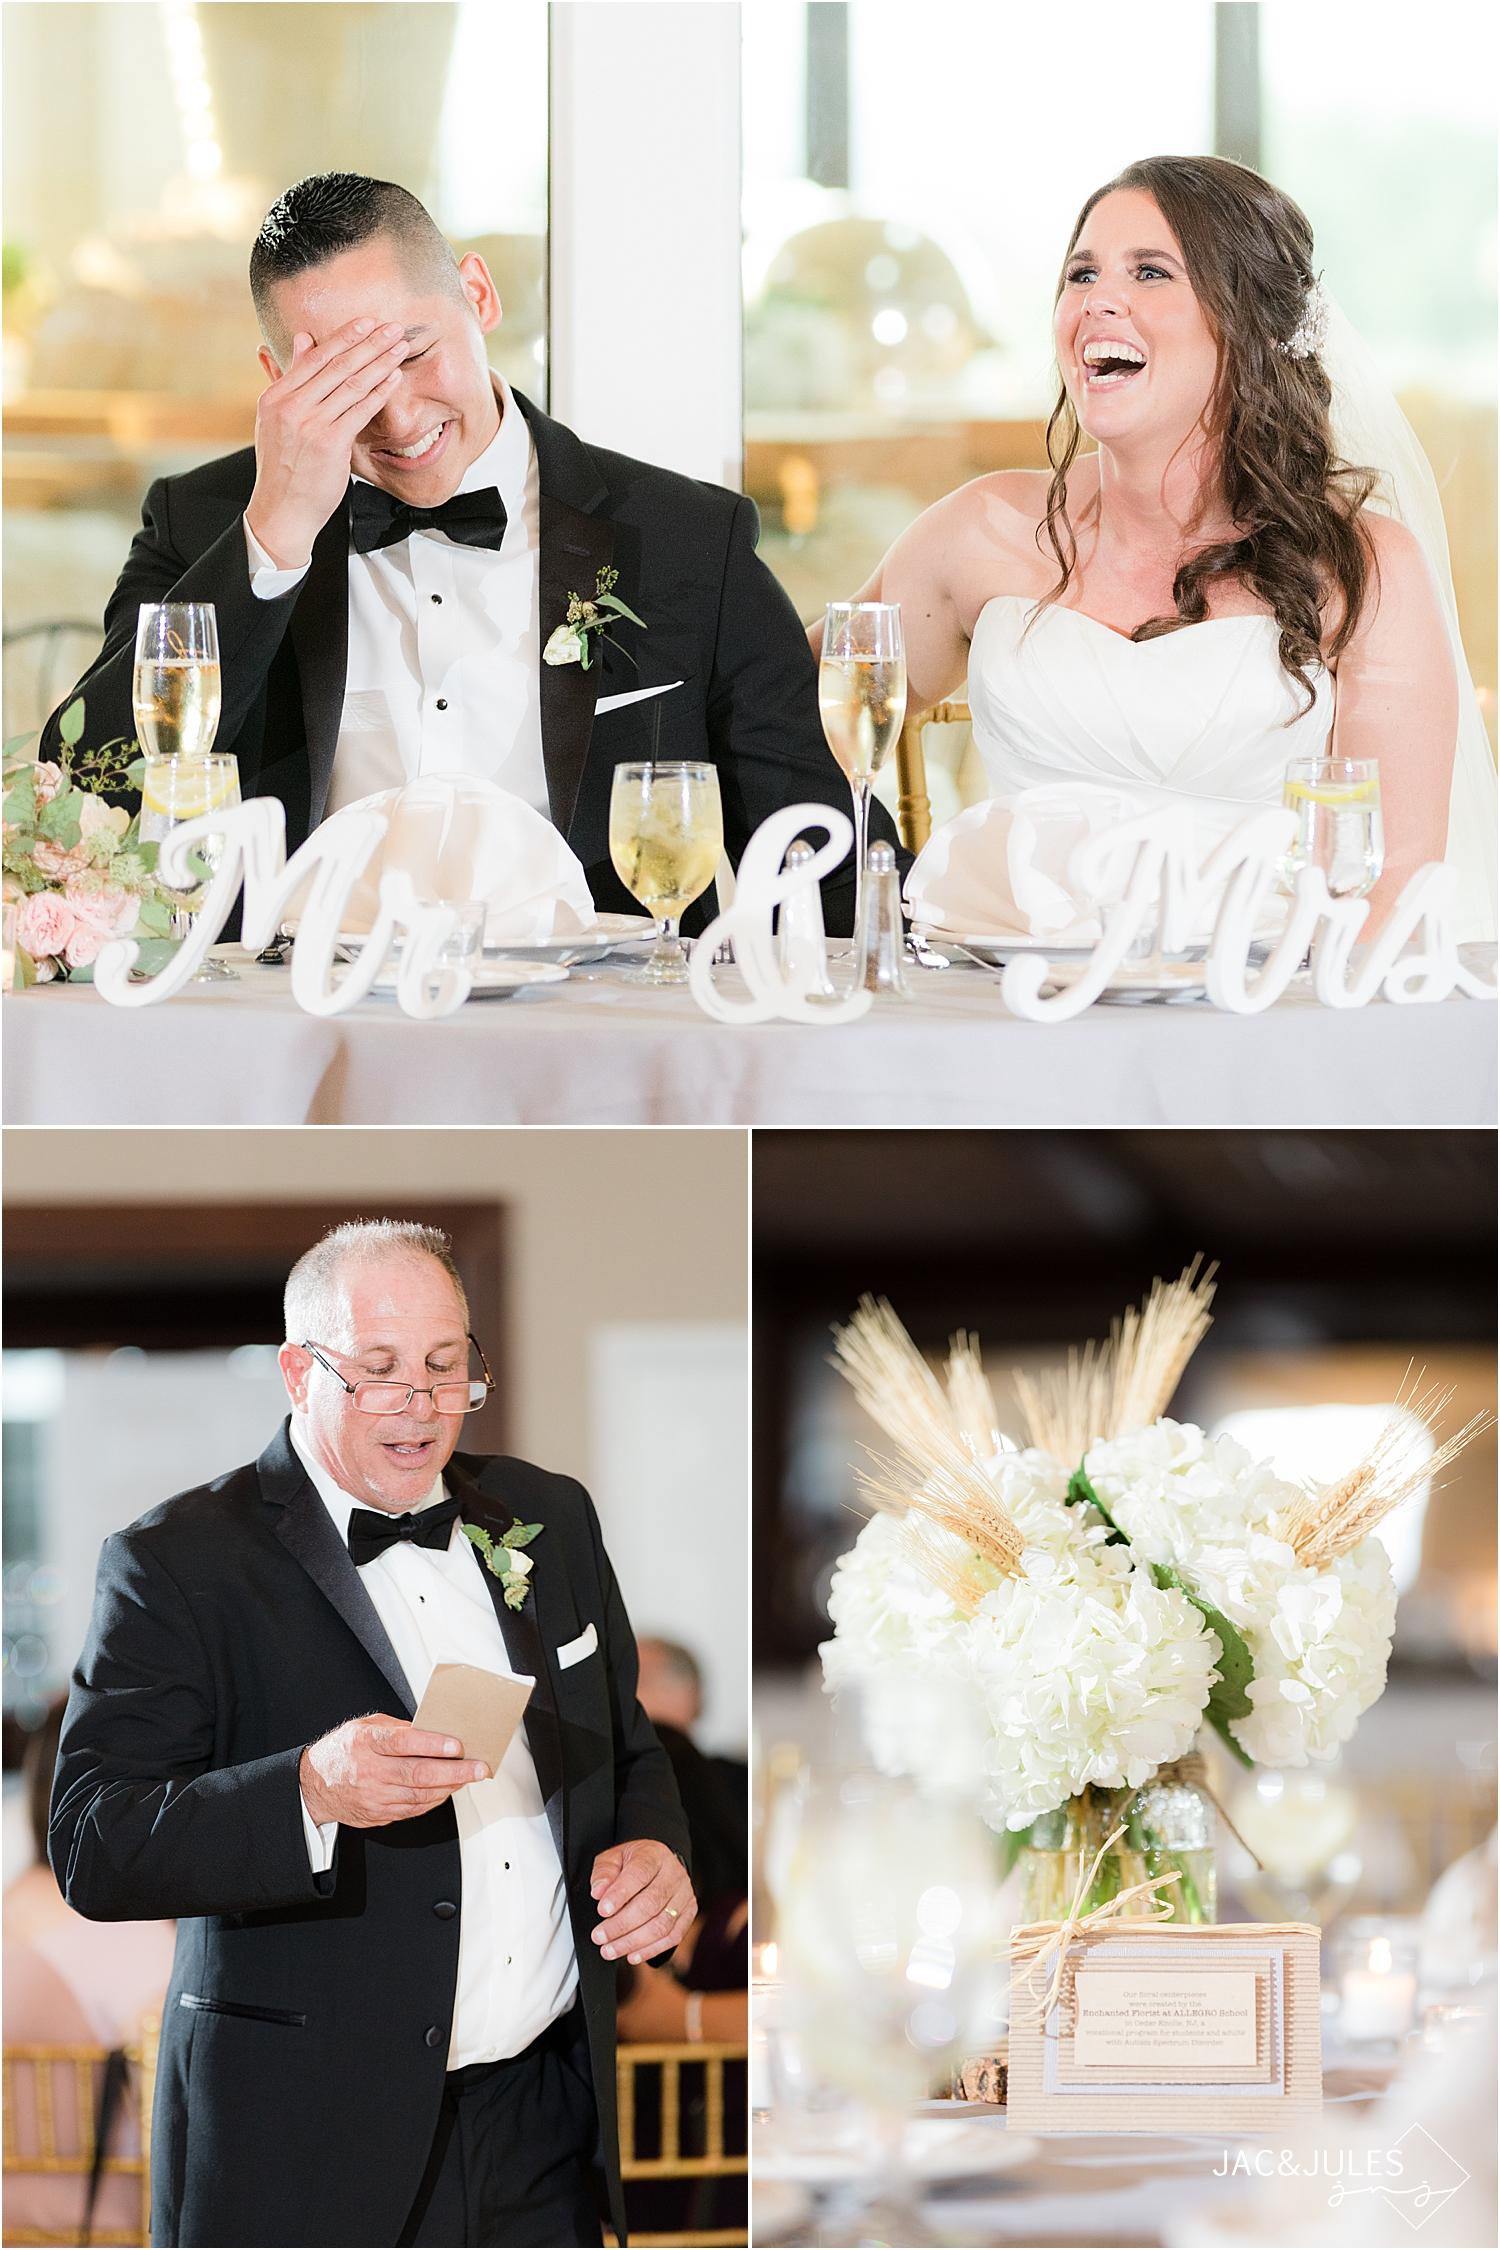 wedding toasts at Skyview Golf Club reception